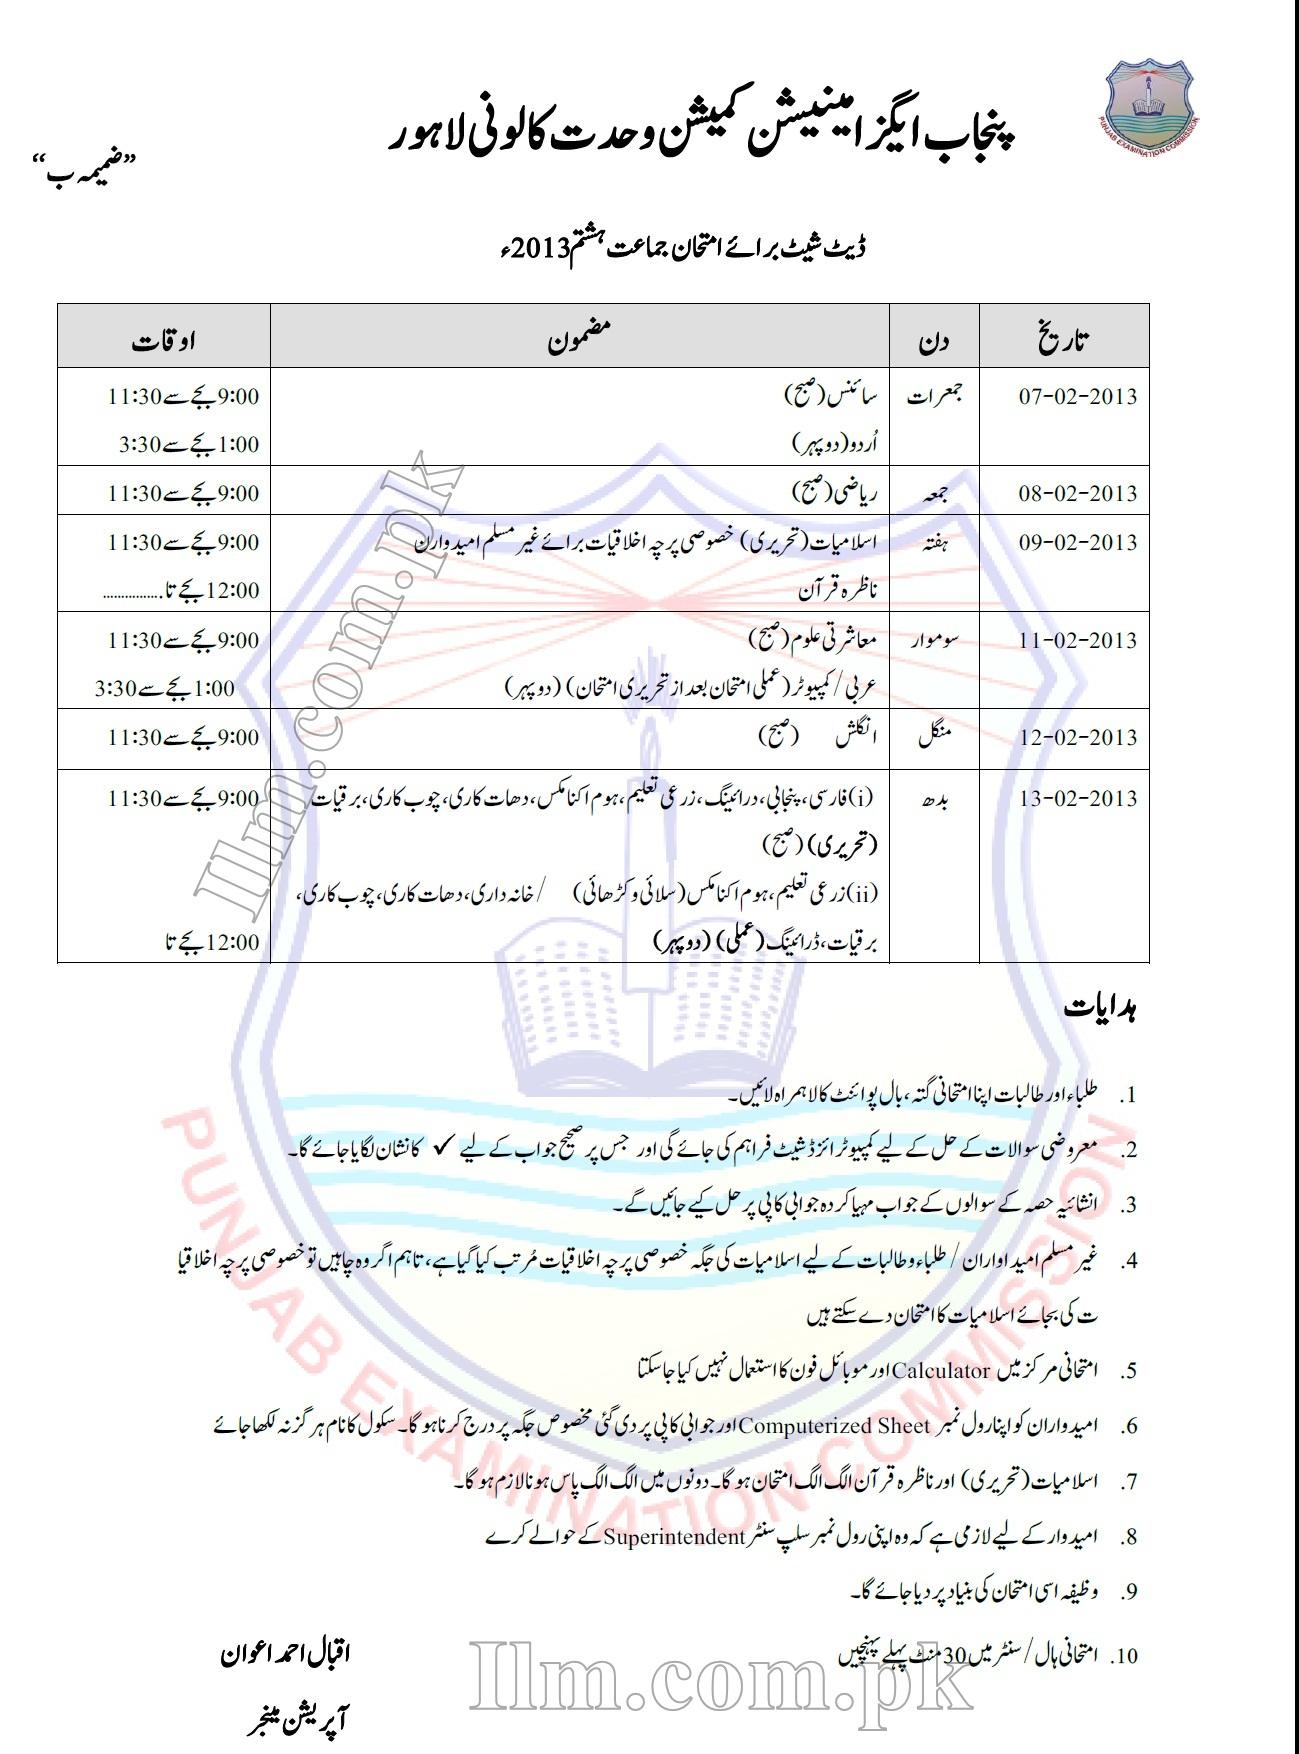 PEC 8th Class Exams Date Sheet 2013